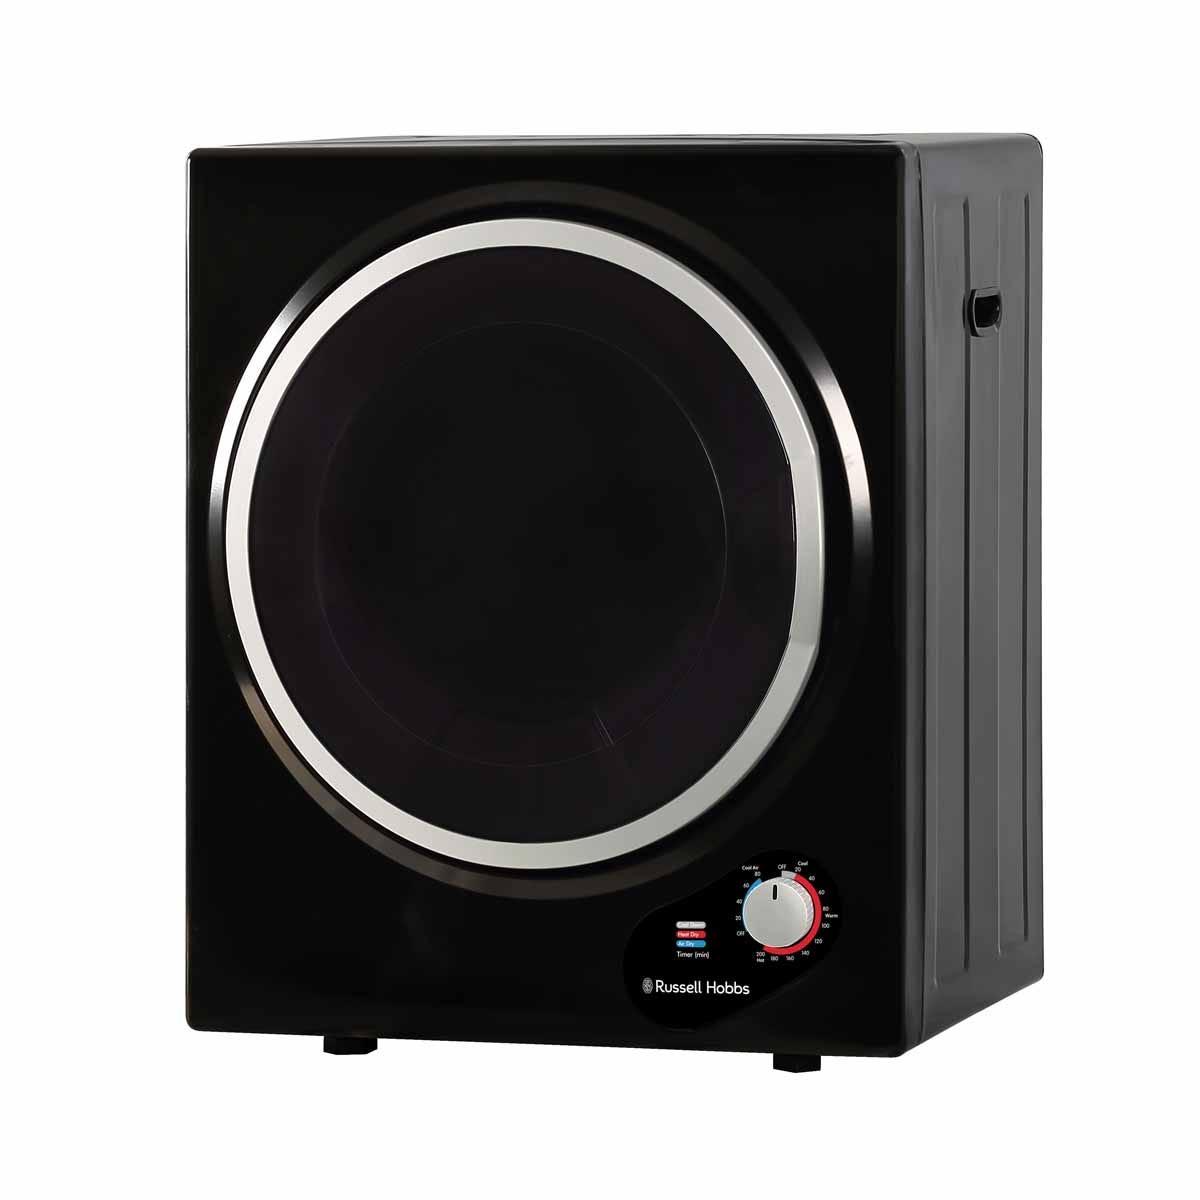 Russell Hobbs RH3VTD800B 2.5kg Compact Vented Tumble Dryer - Black